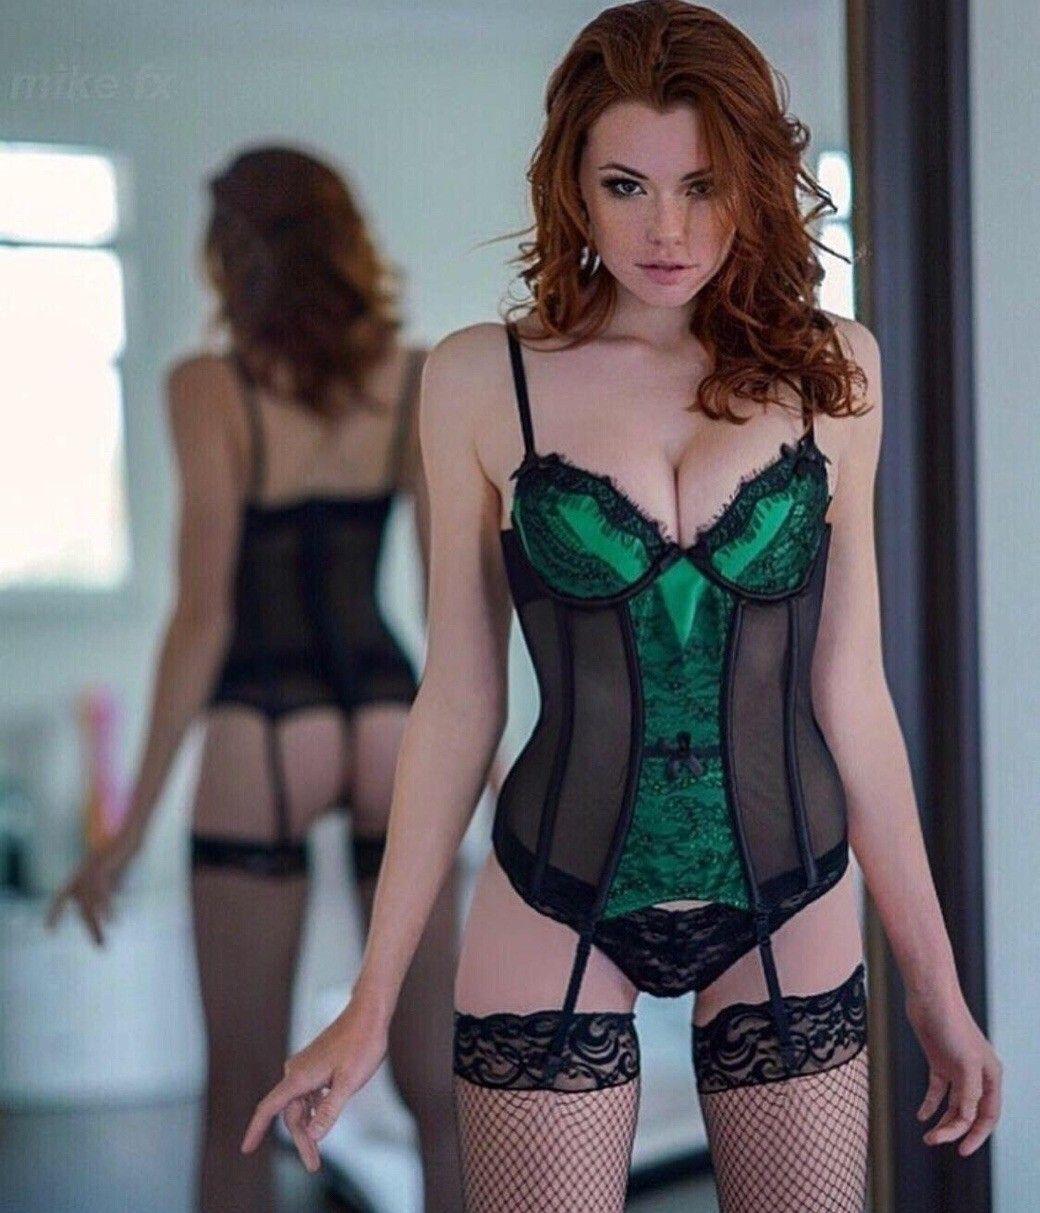 Redhead corset panties — photo 3